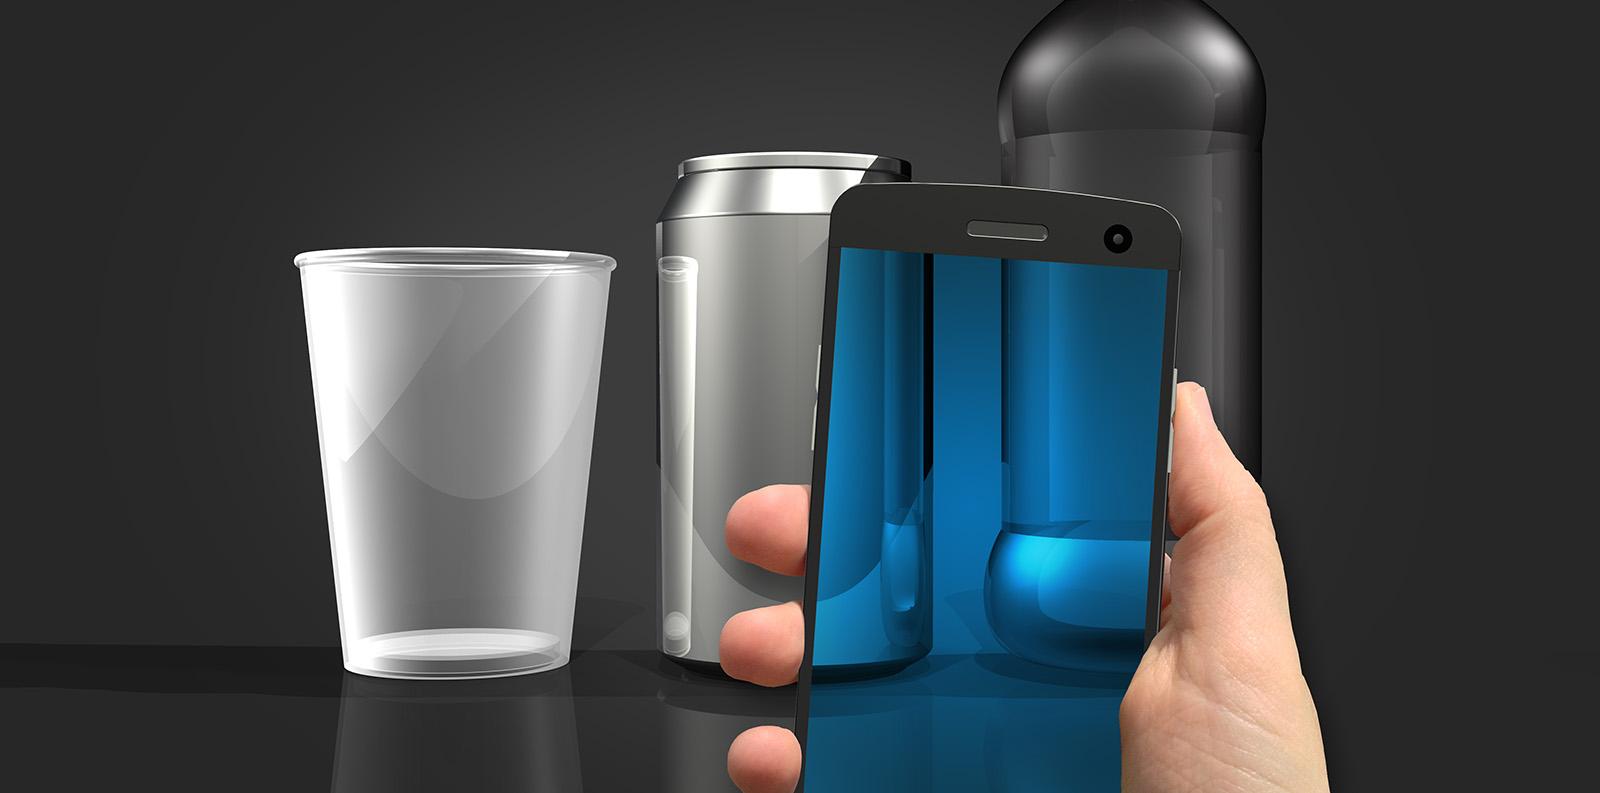 Smartphone object scanning